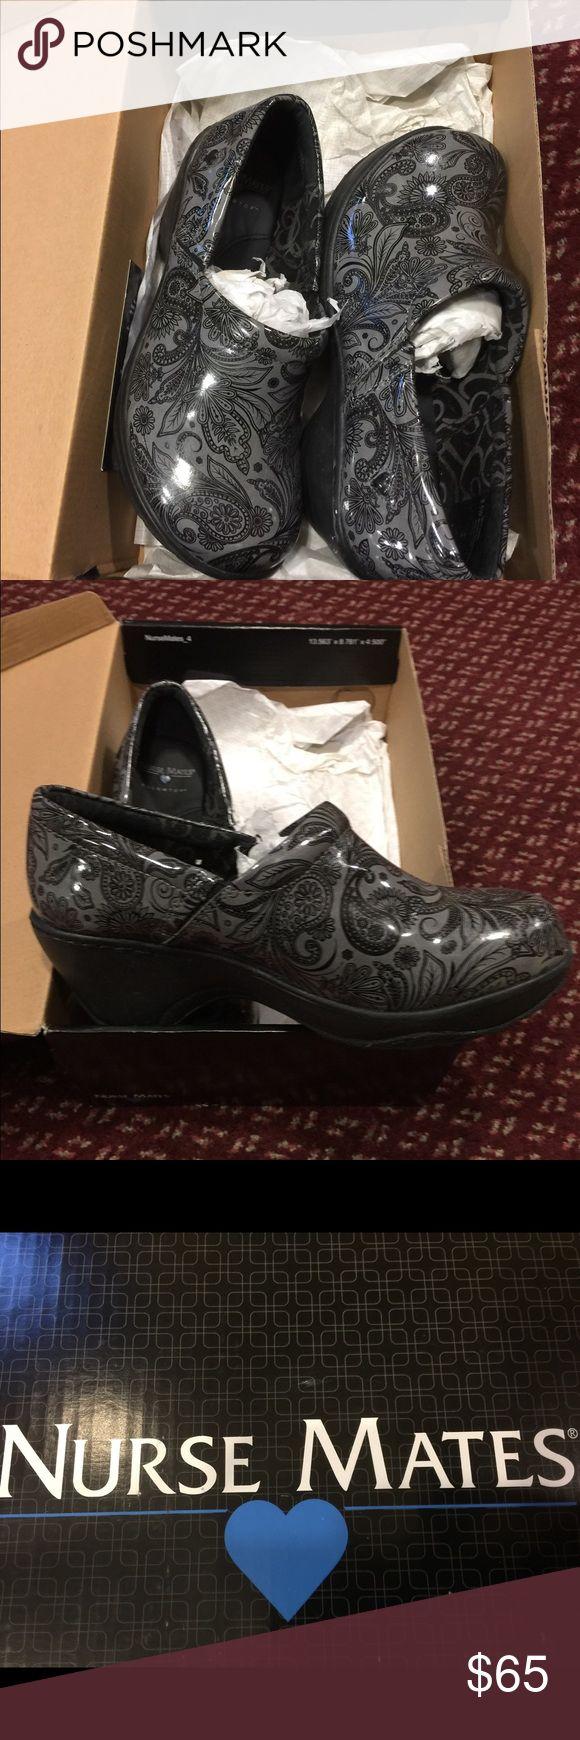 NURSE MATES 👩🏼⚕️ Very Comfortable 😊 Nurse Mates Shoes Mules & Clogs